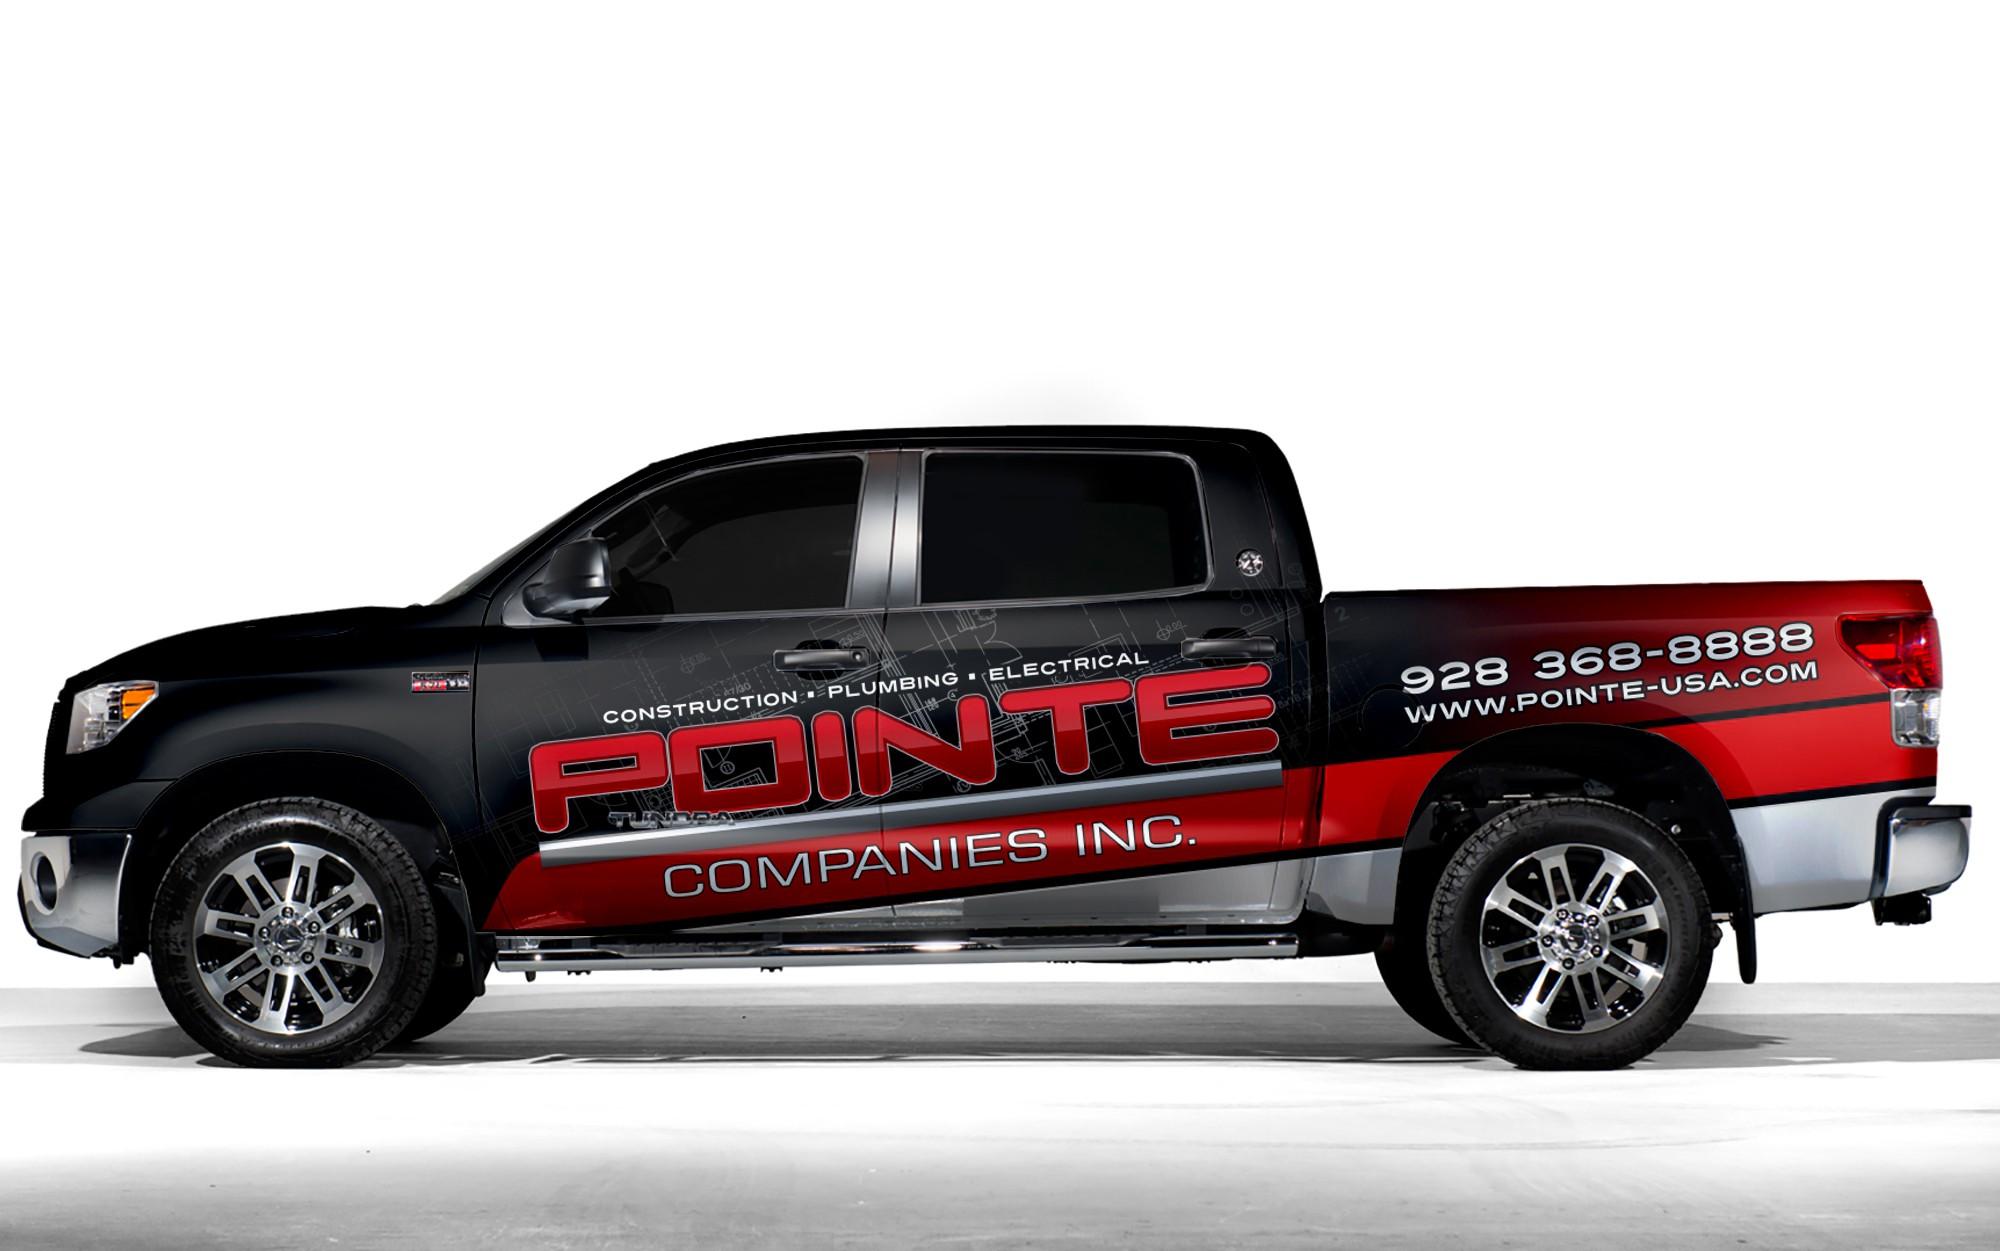 Pointe Companies Truck Wrap